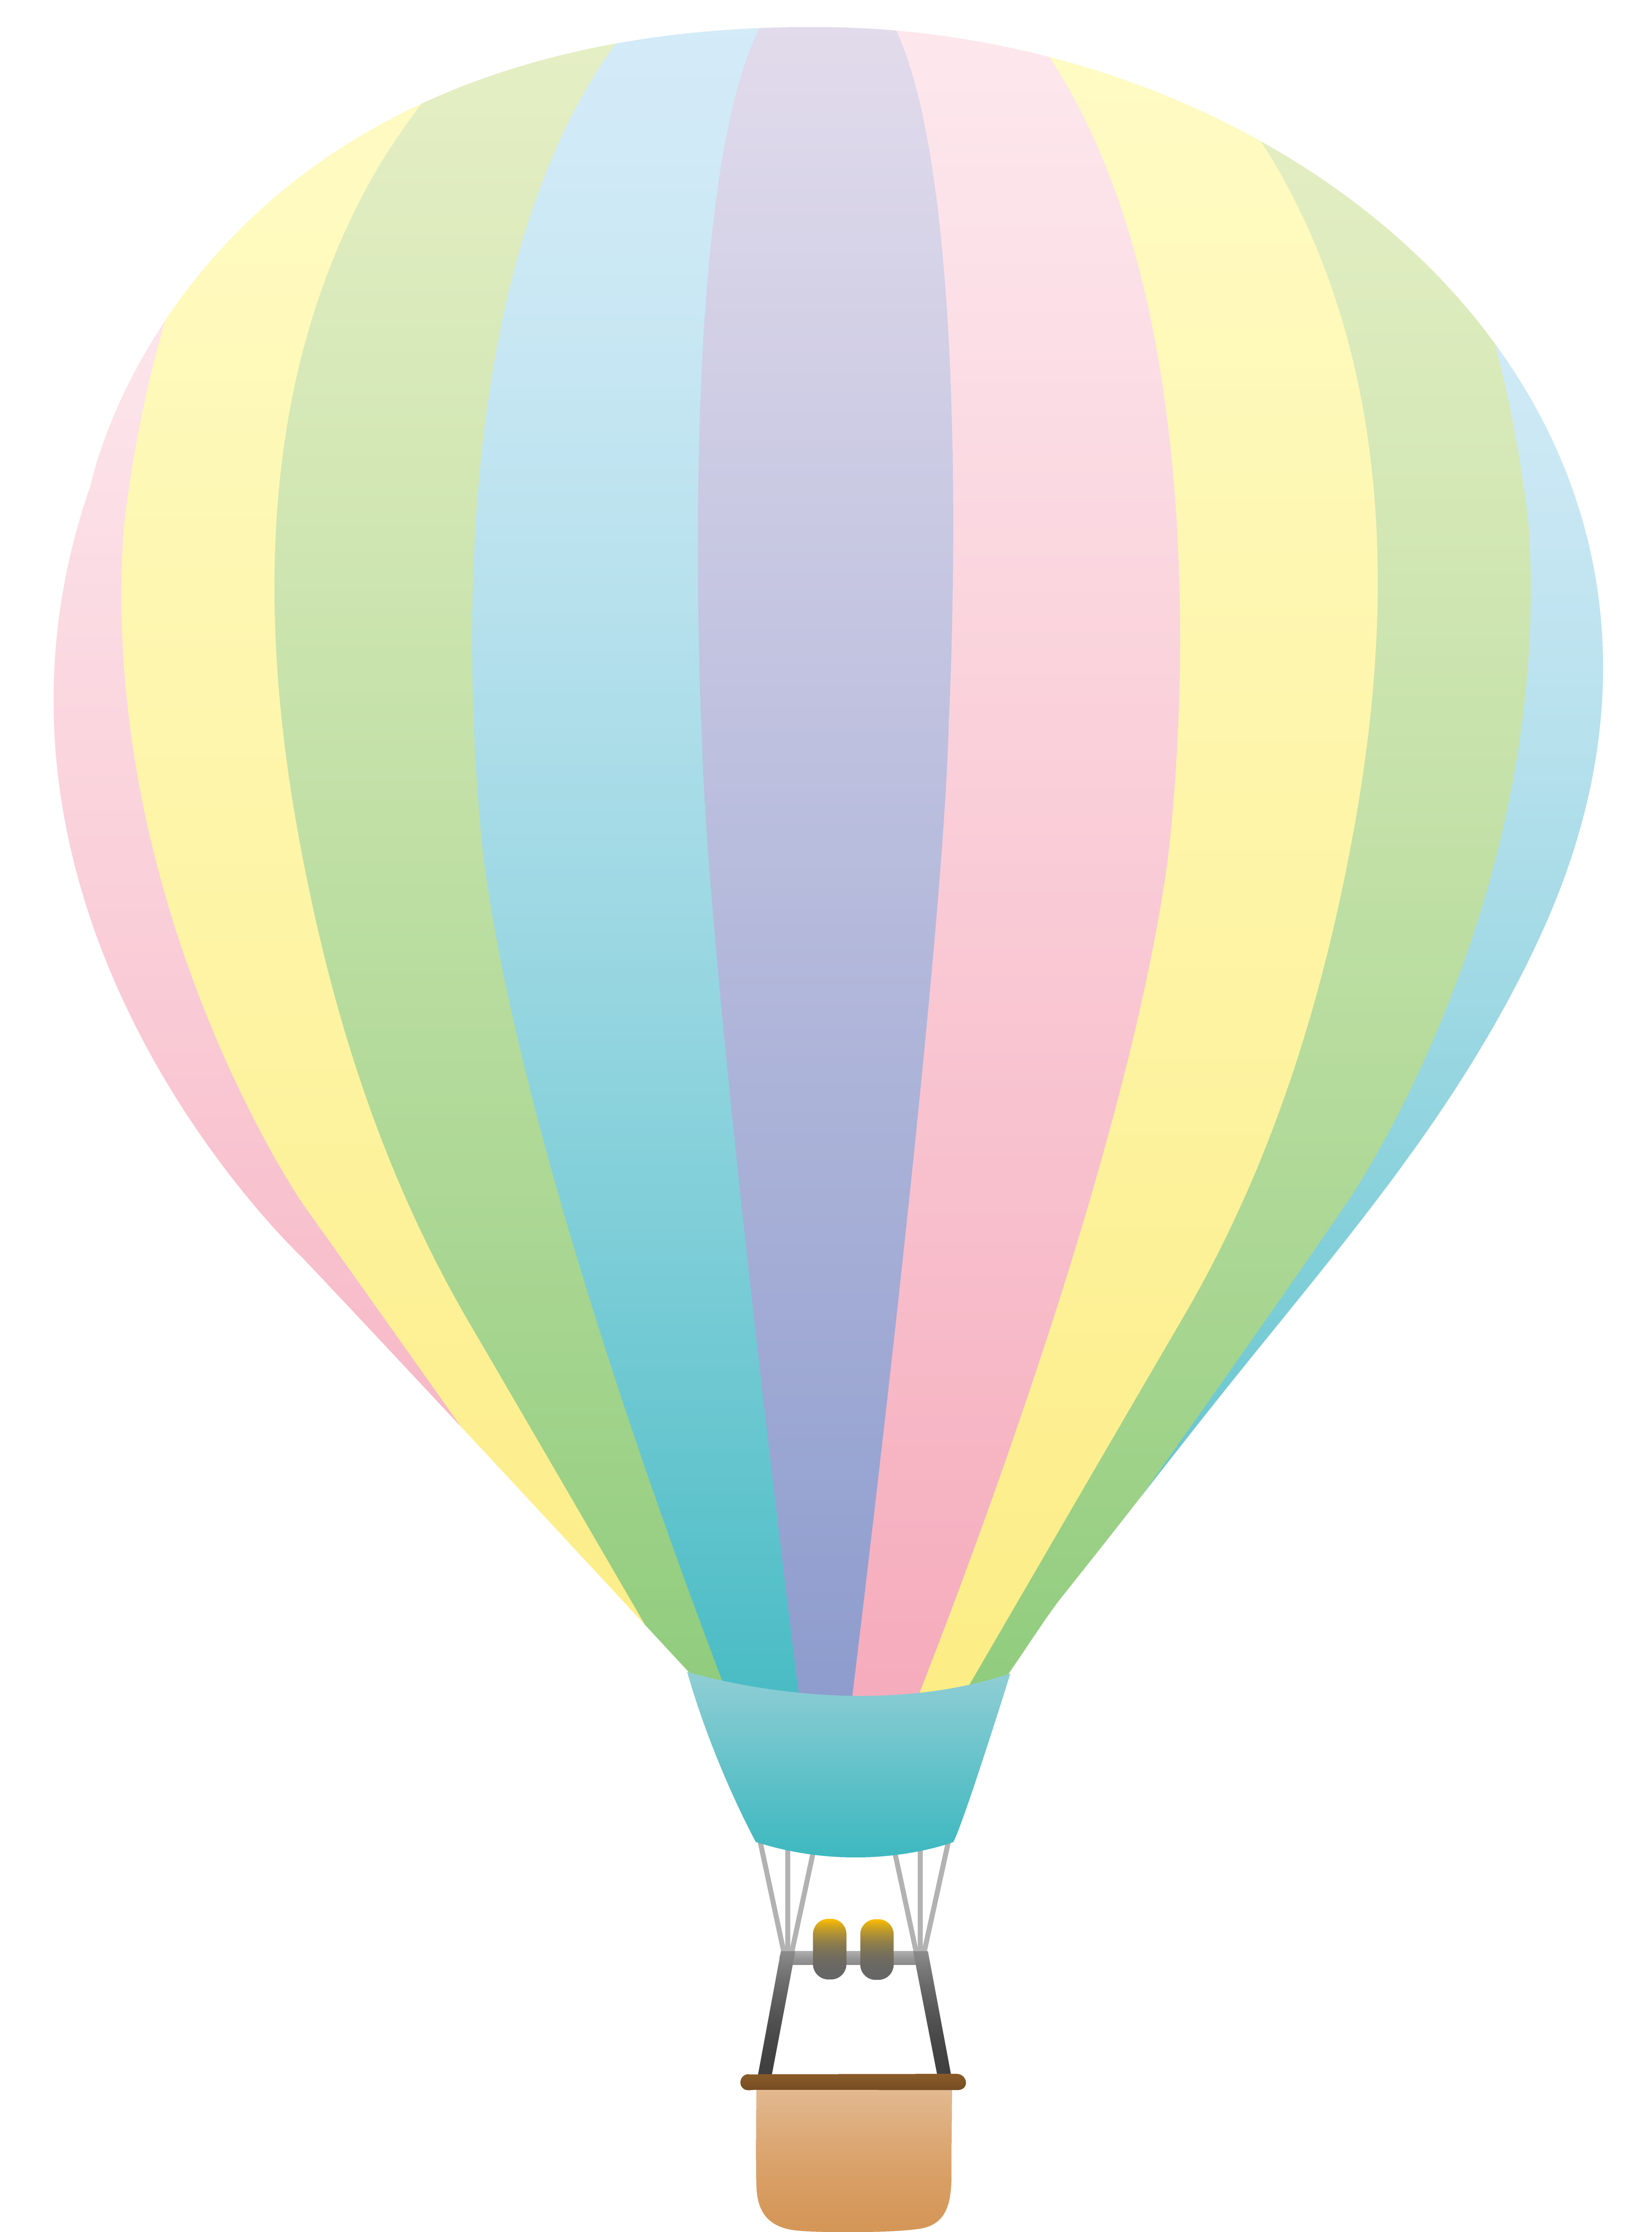 Lavender clipart hot air balloon. Oblong frames illustrations hd